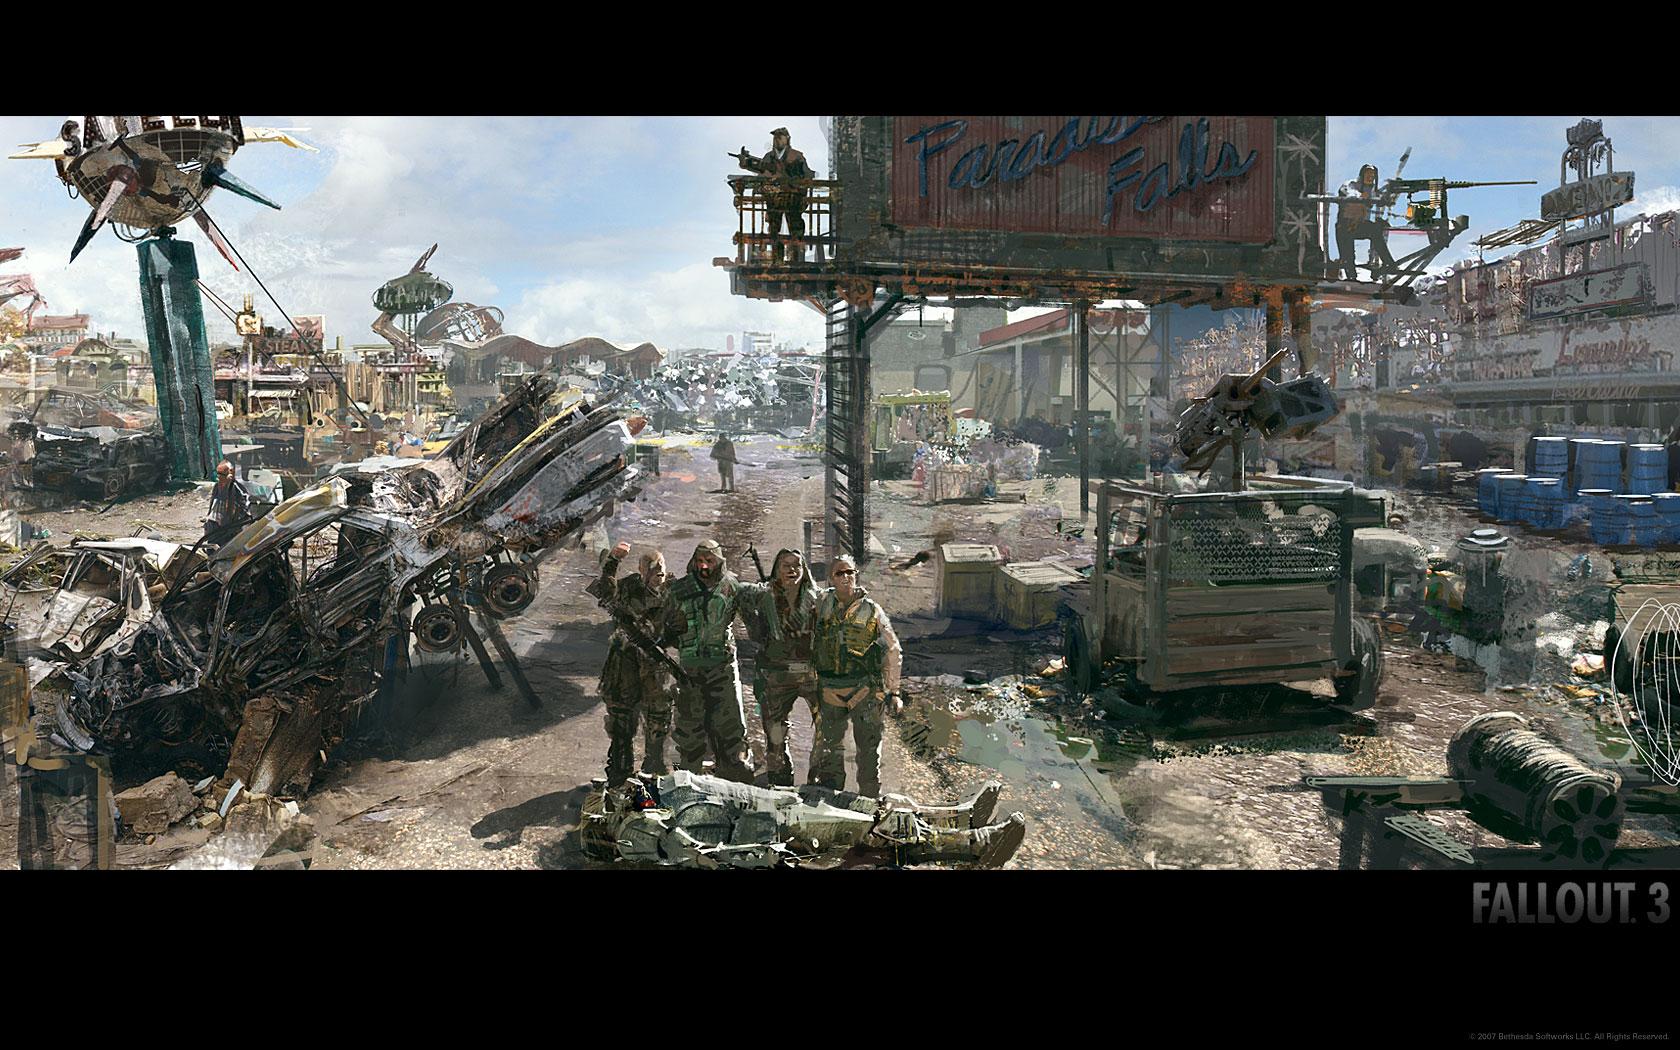 Fallout 3 Wallpapers Desktop Game Wallpapers 1680x1050